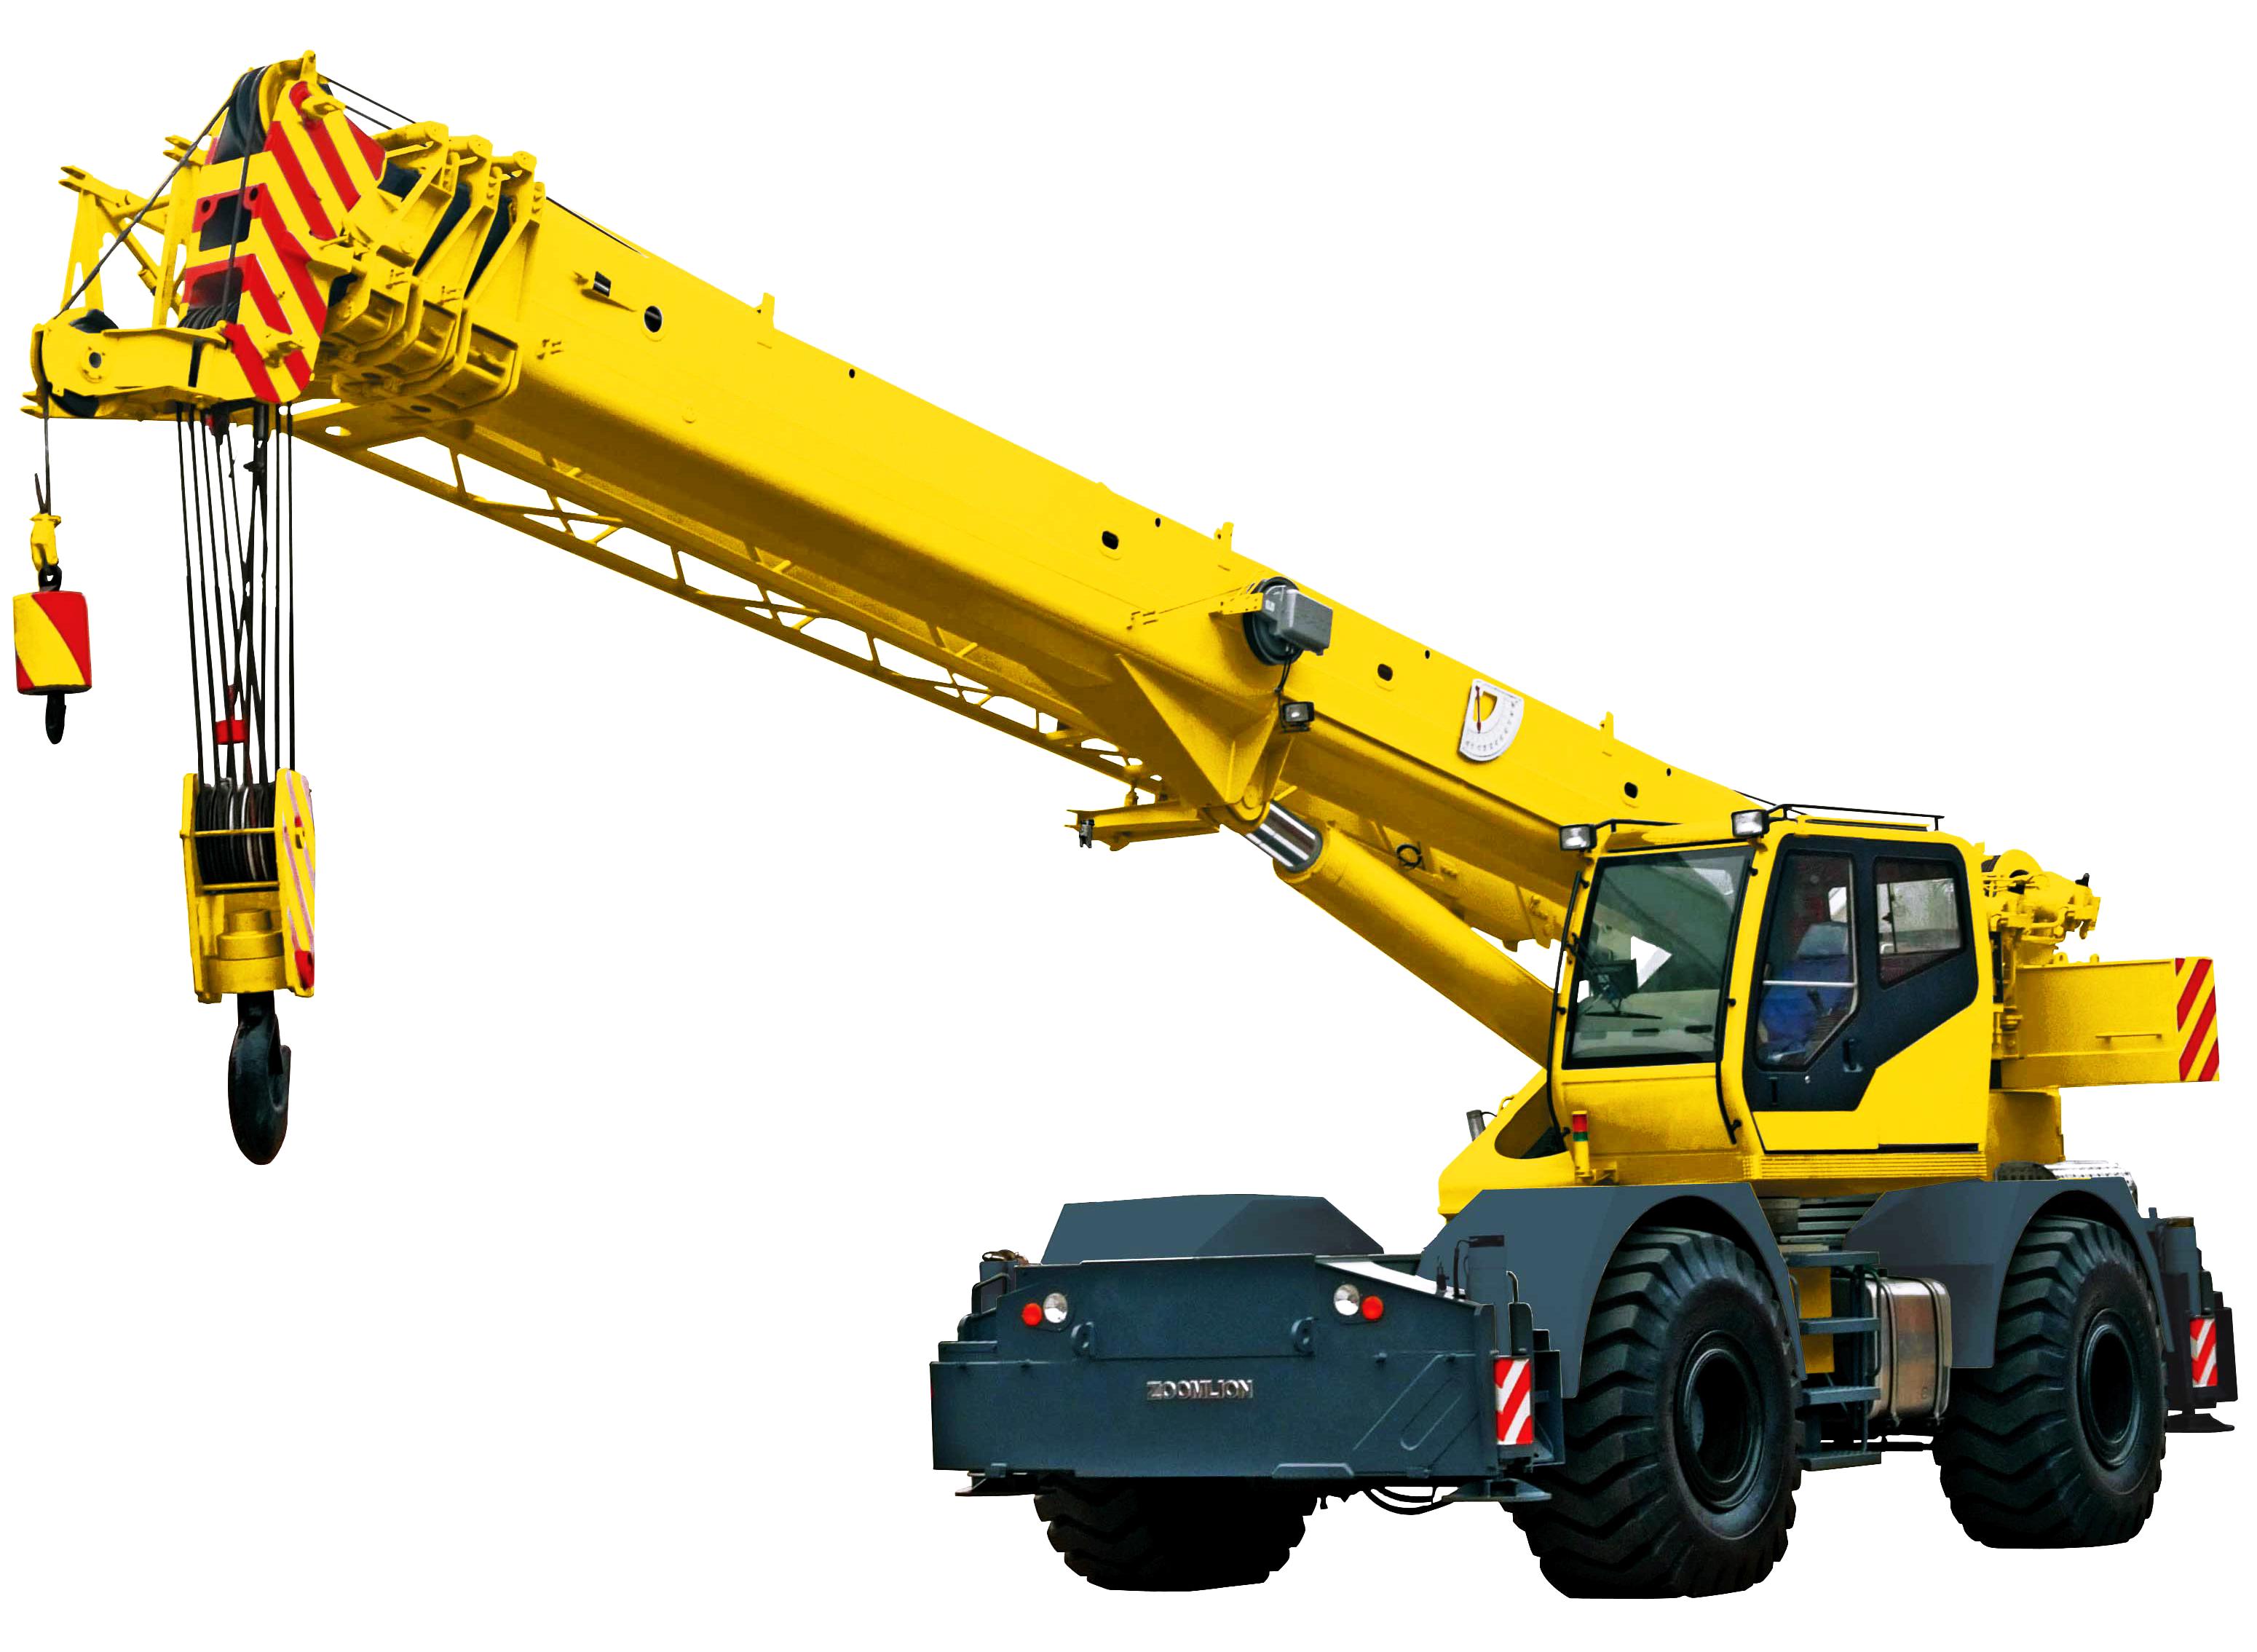 Hd png transparent images. Crane clipart hydraulic crane